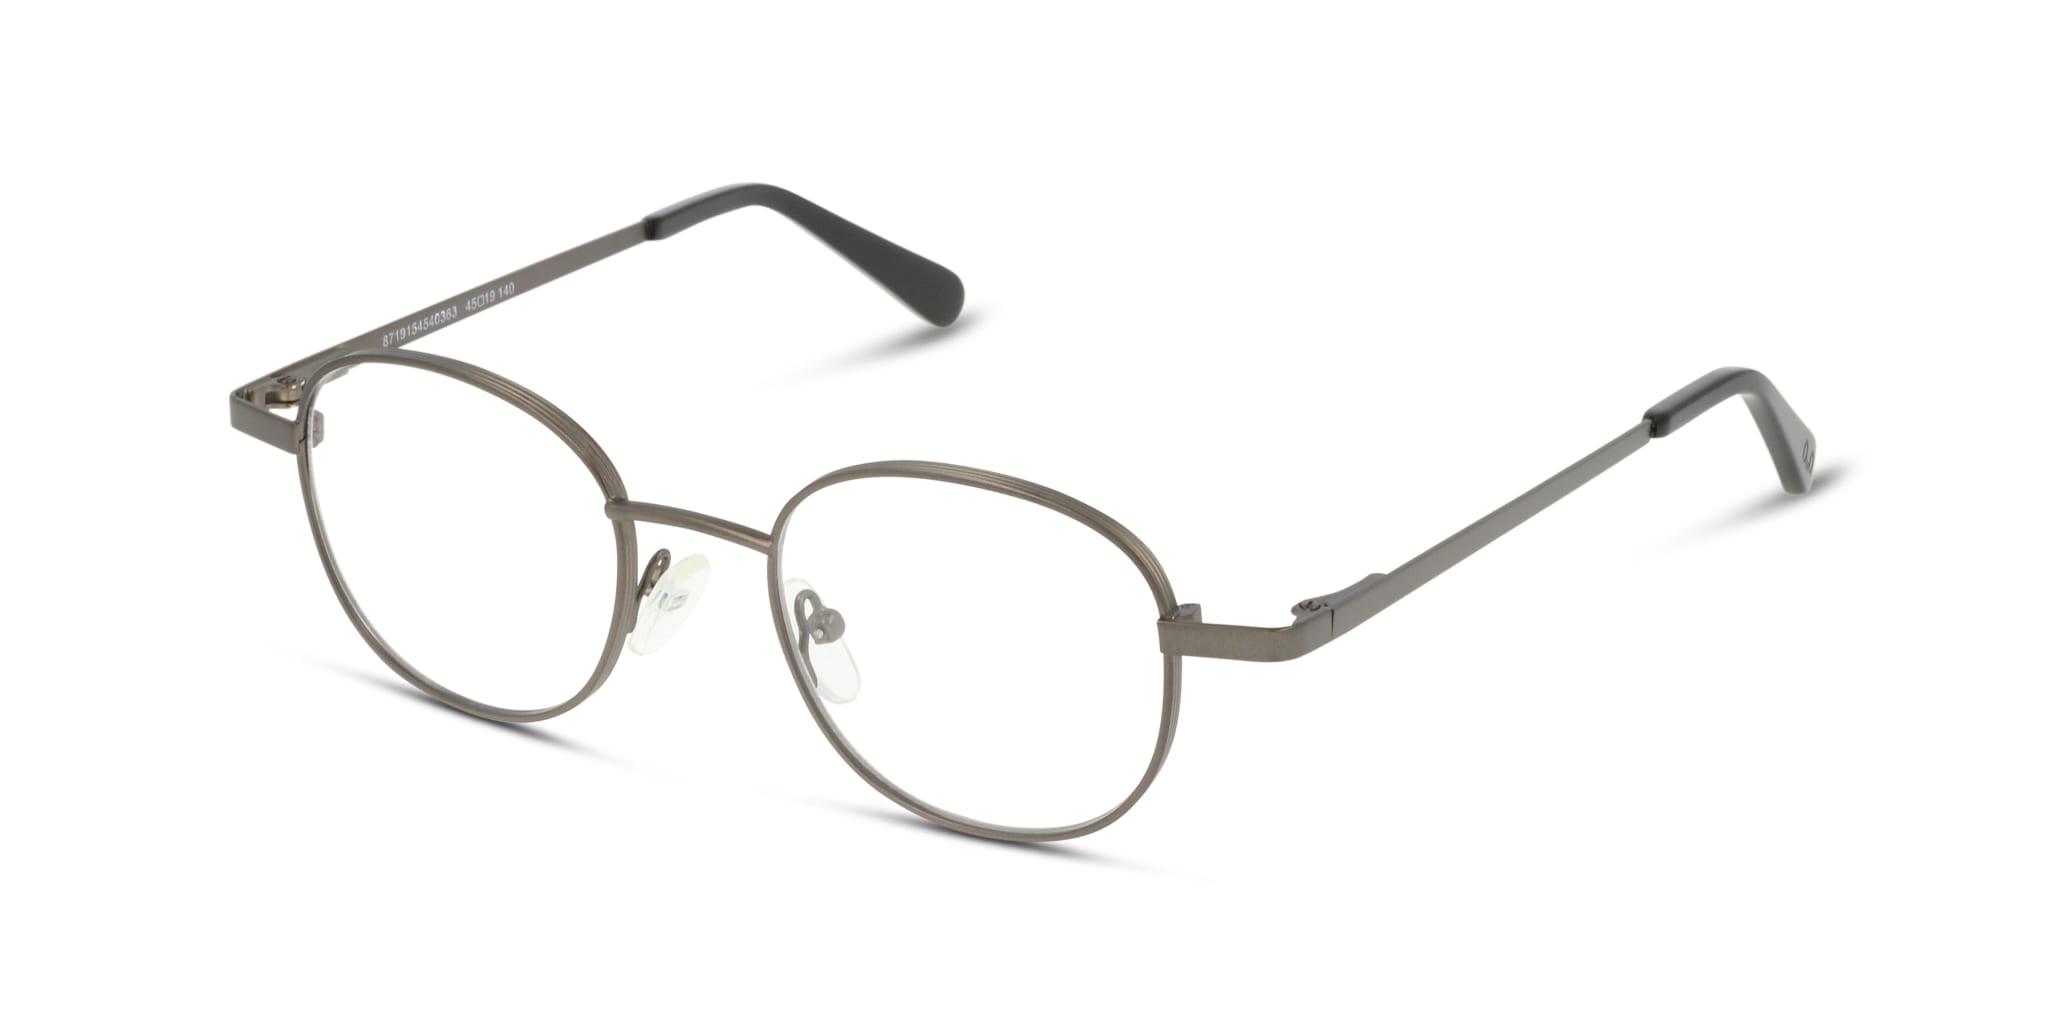 8719154540363-angle-03-d-by-d-dbku03-eyewear-grey-black